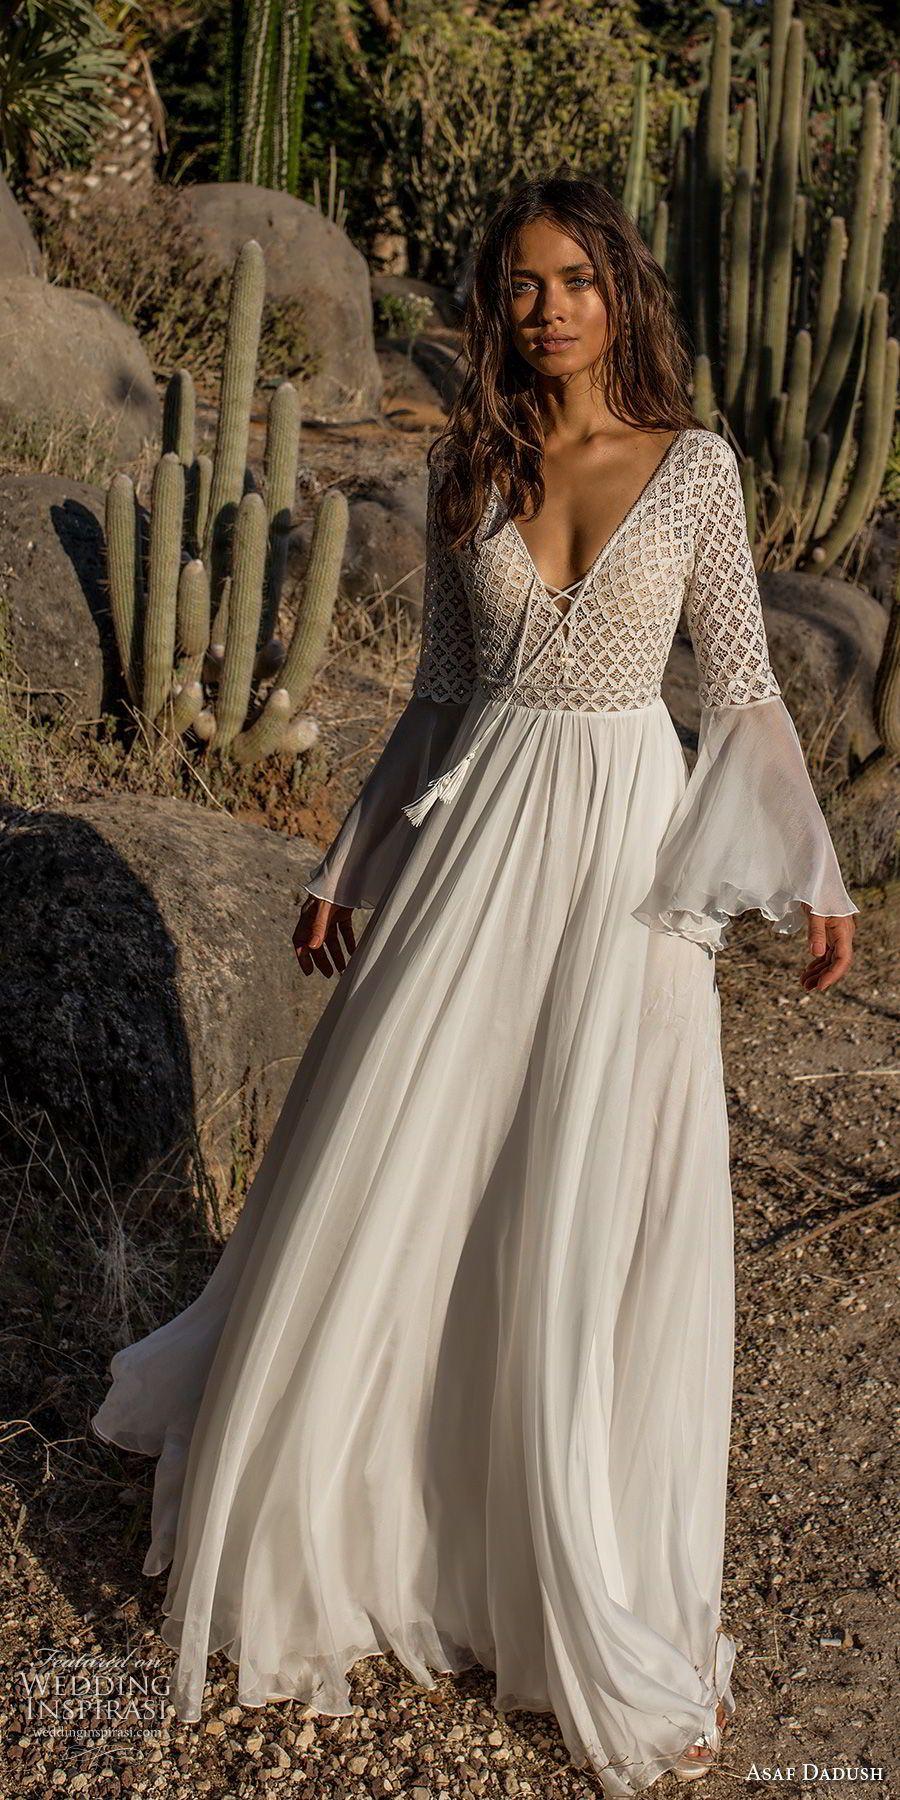 Asaf dadush wedding dresses beach weddings pinterest